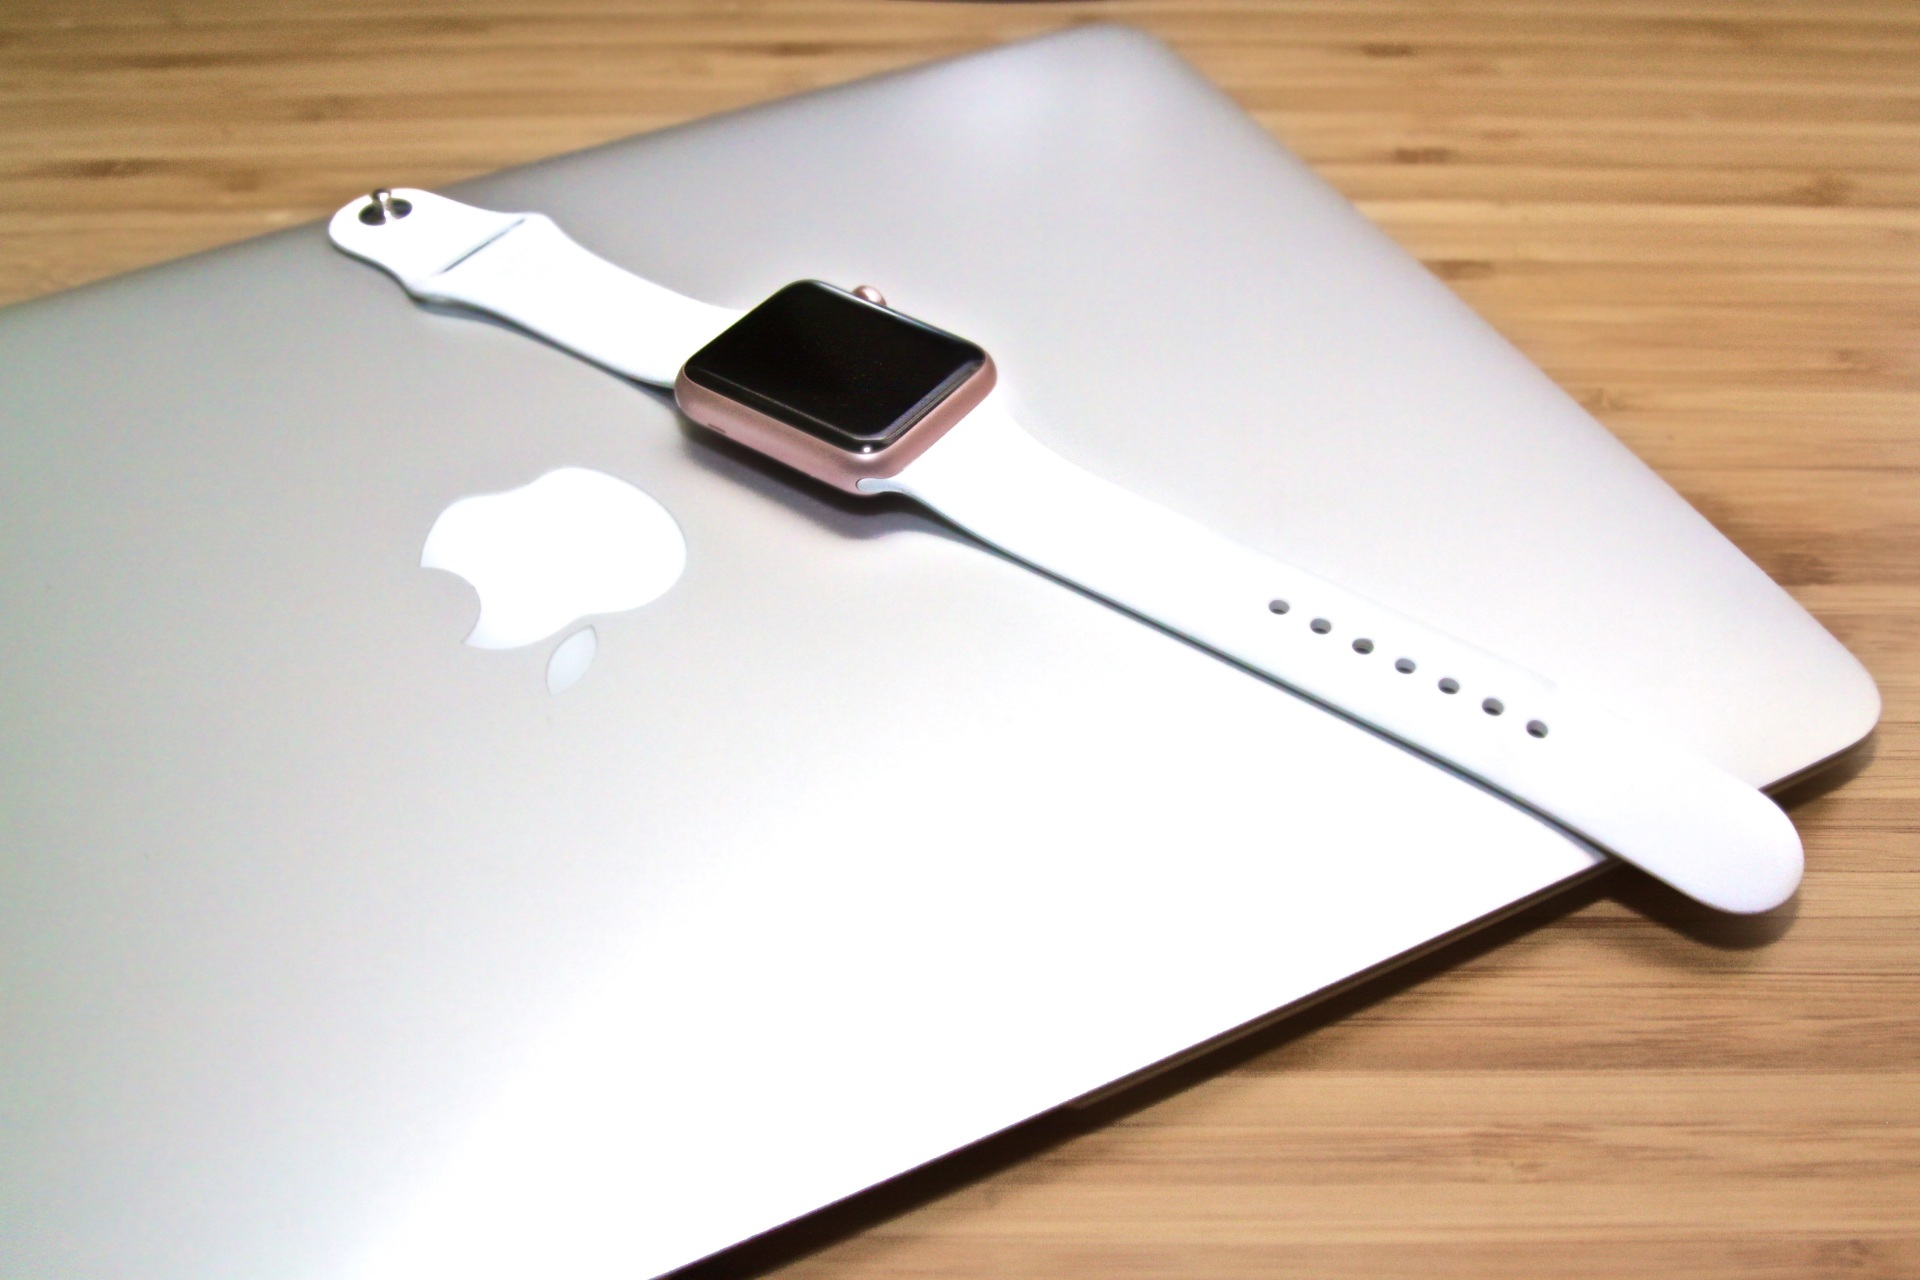 Macbook Apple Watch Relógio Apple Portugal Pedro Topete Blog